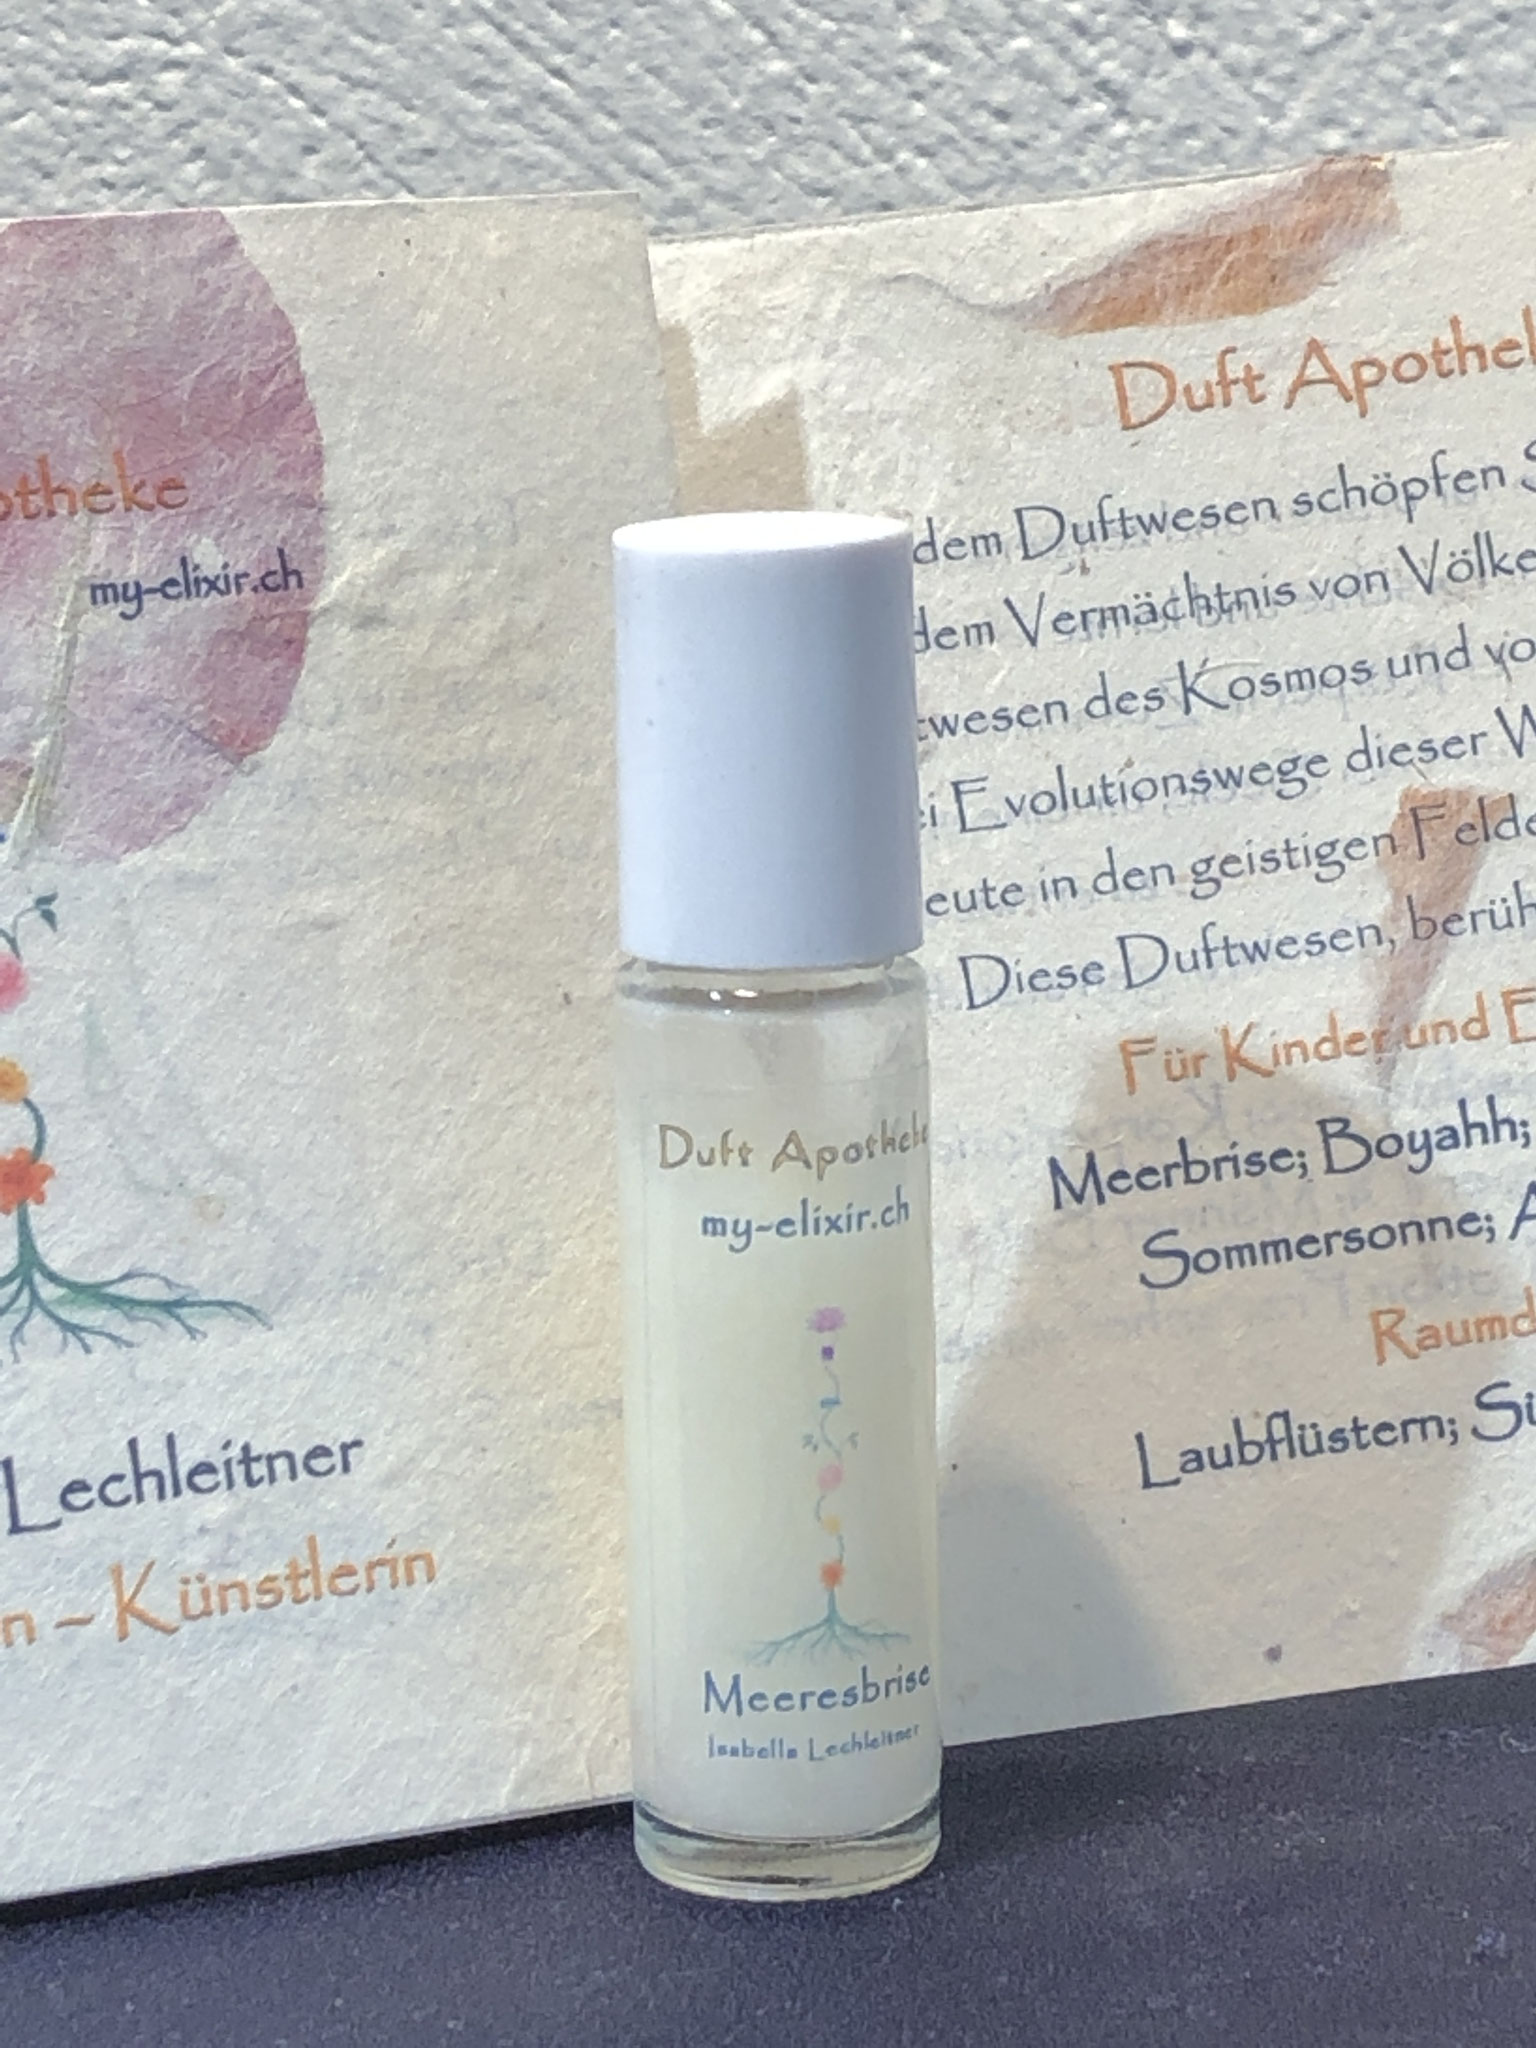 Meeresbrise, Isa, Noun, 1001, Sommersonne, Boyahh, Atlantis Rose - Duft Apotheke my-elixir.ch